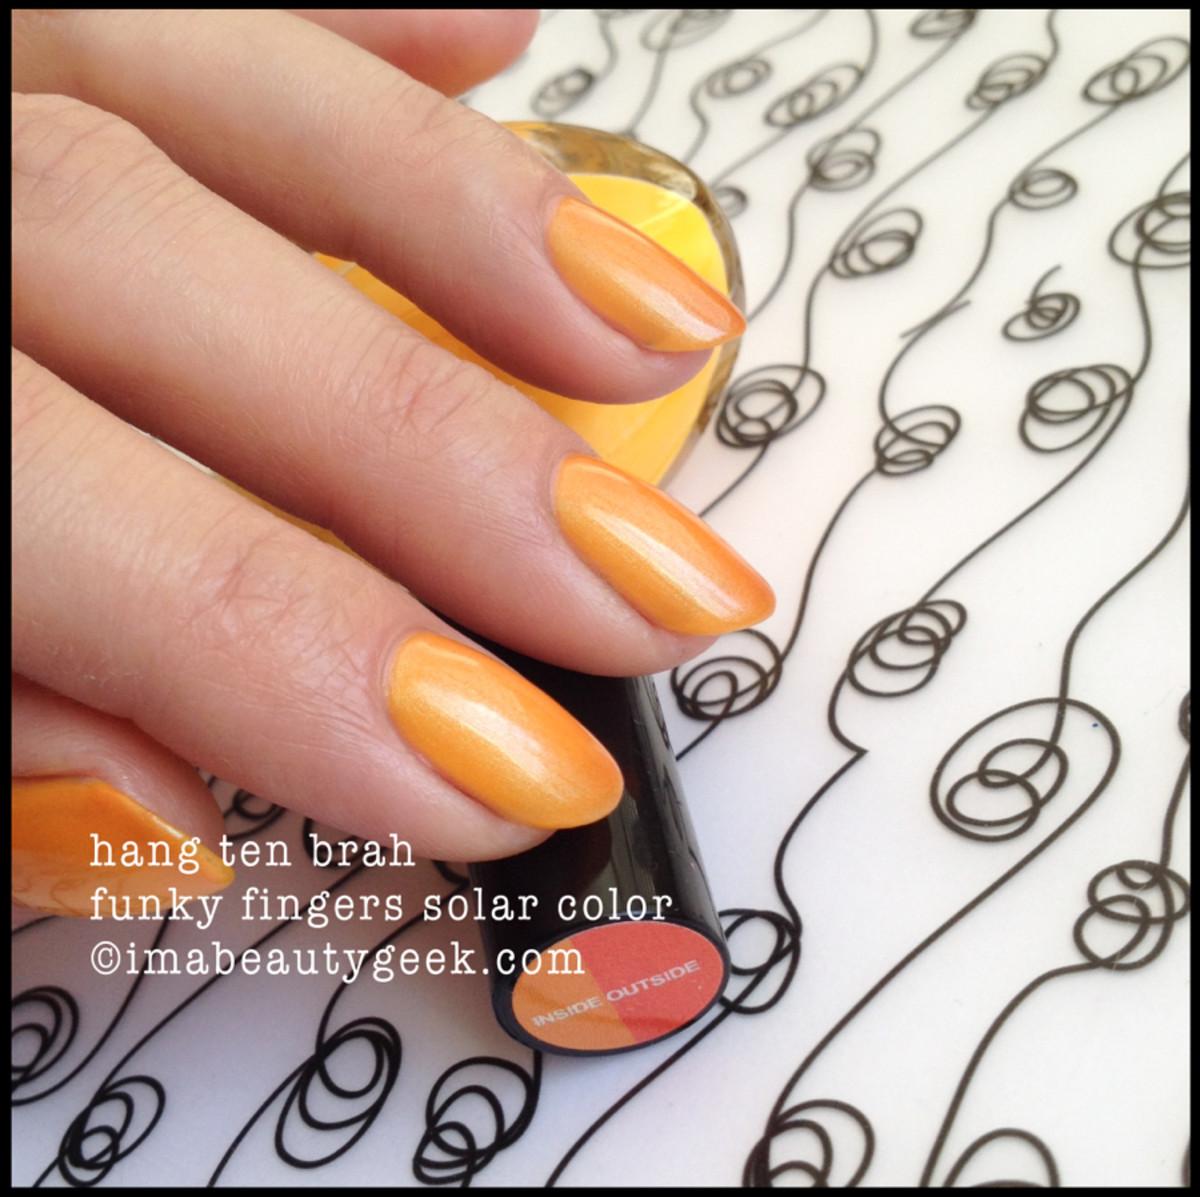 Funky Fingers Hang Ten Brah Solar_3